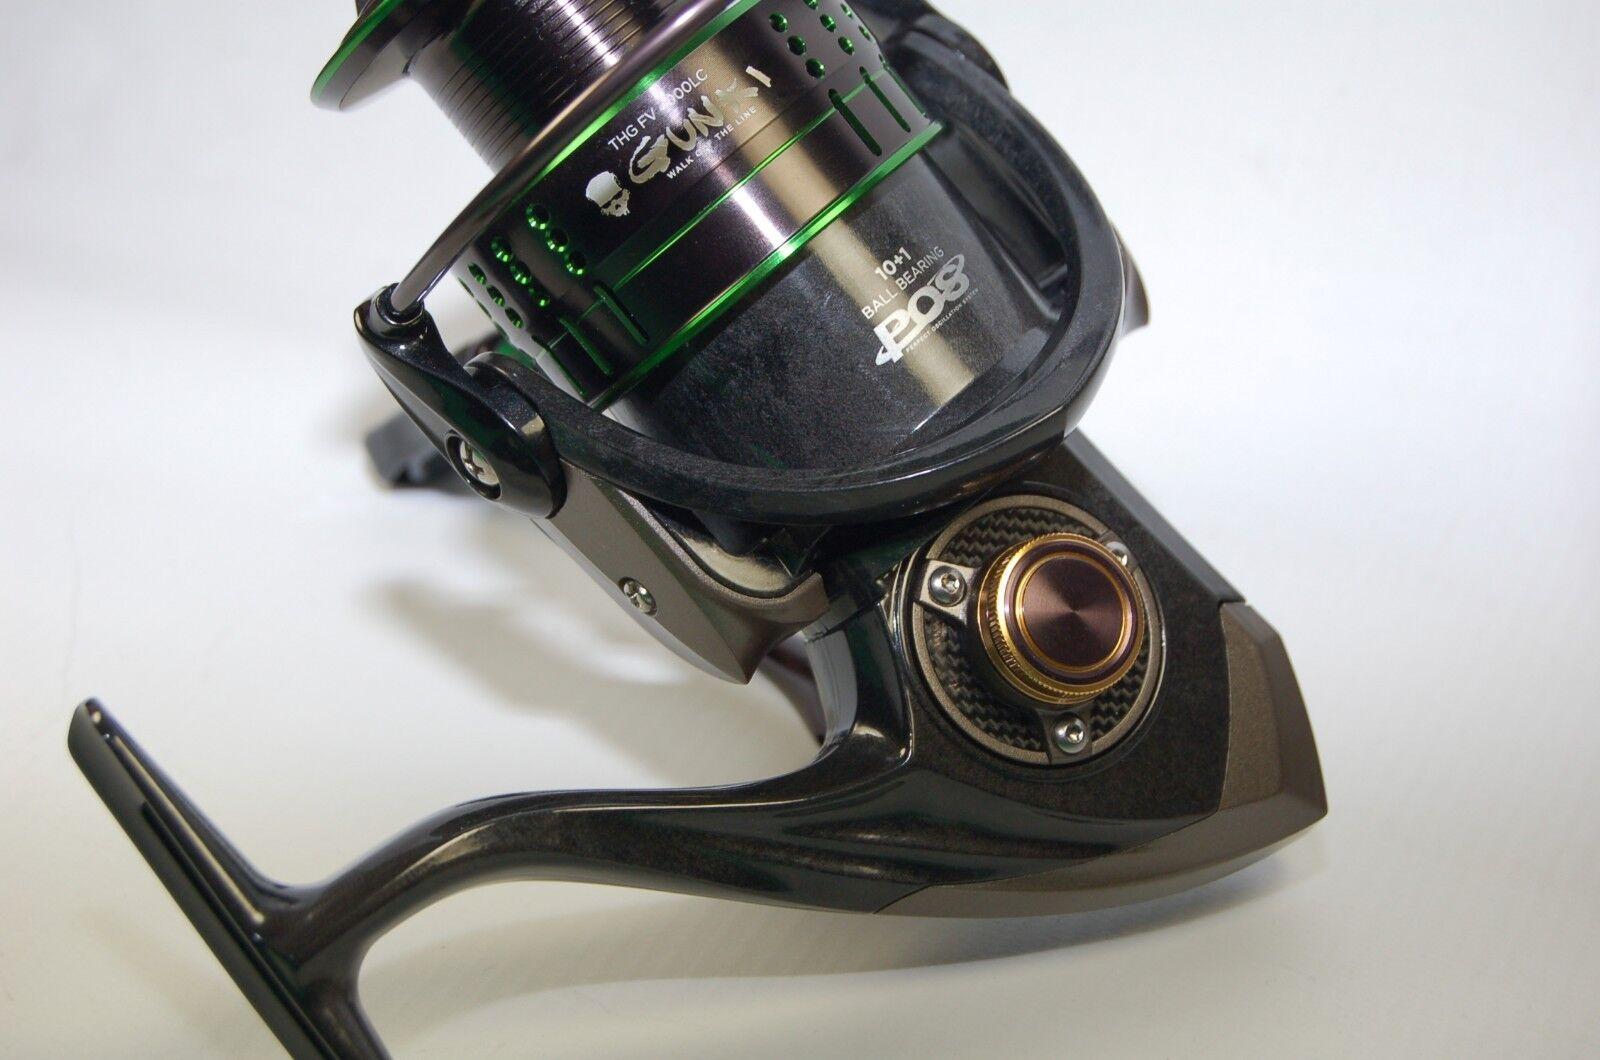 Gunki THG FV 4000LC 4000LC 4000LC Angelrolle Stationärrolle Spinnrolle Spinnfischen Kopfbremse c7f993